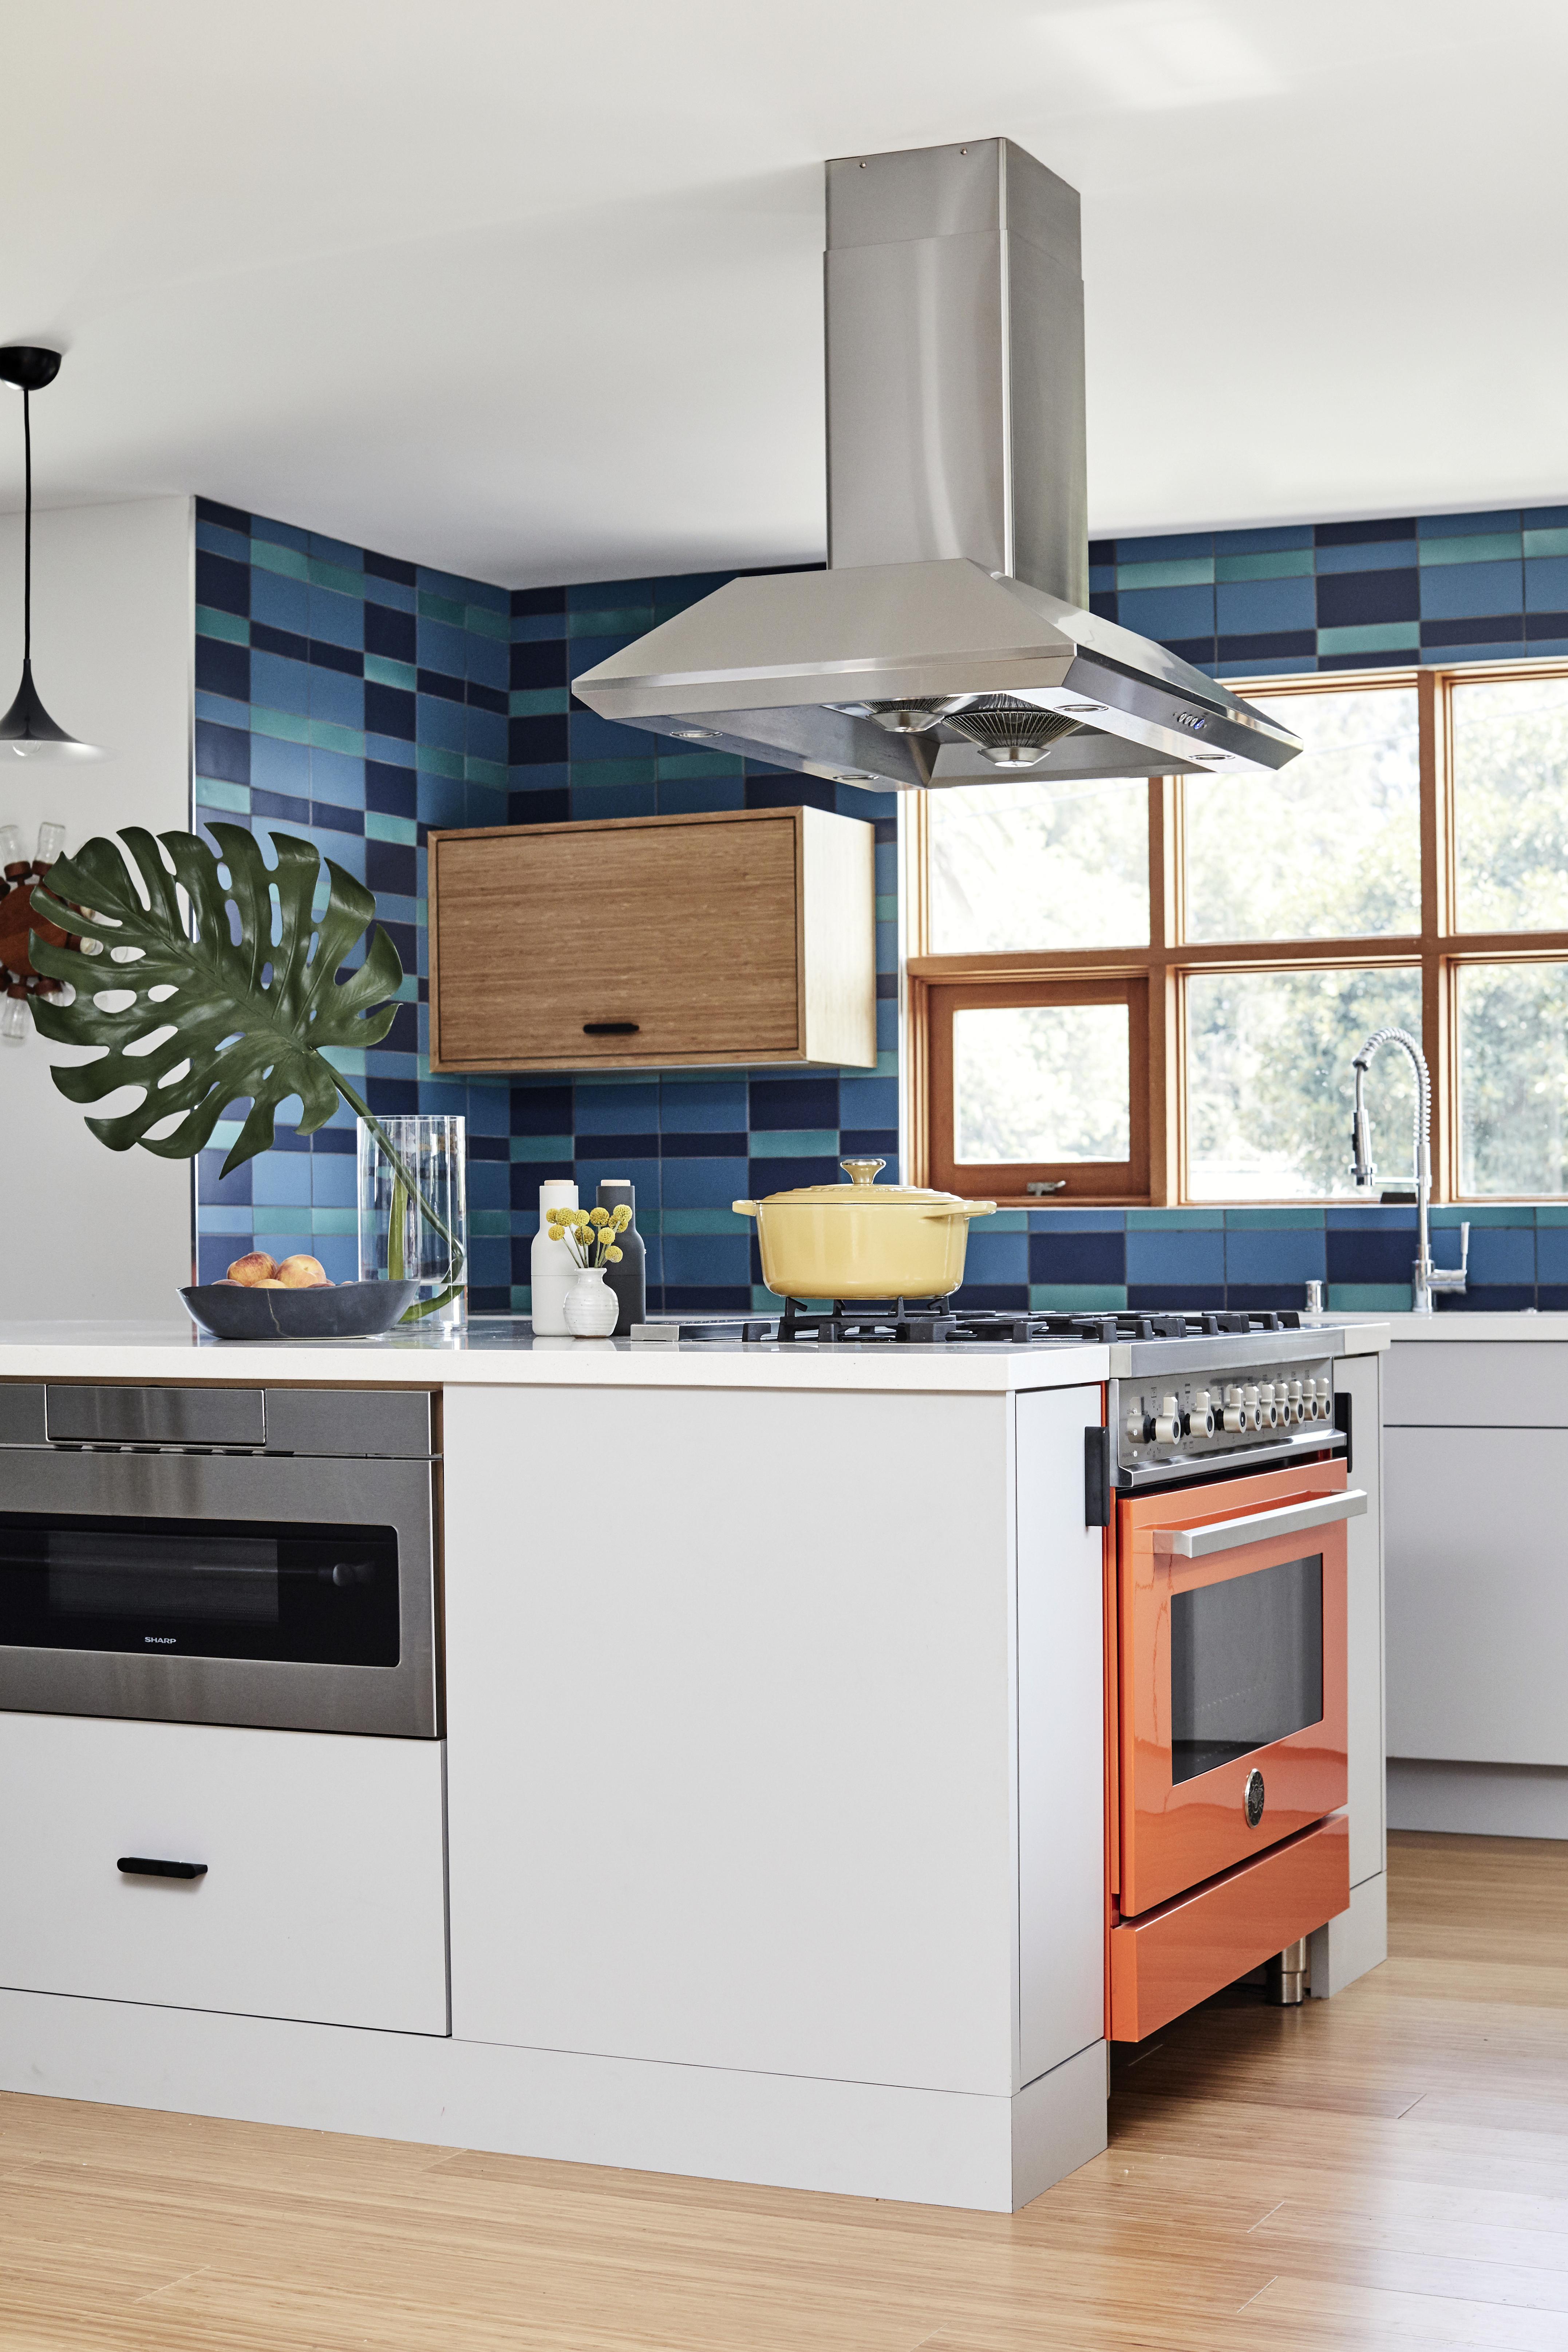 2017_q4_img_hi_res_rights_residential_the_niche_home_jenna_Peffley_photo_ceramic_kitchen_backsplash_plaid_peacock_2x8_4x8_fluorite_2x8_4x8_blue_velvet_2x8_4x8_blend_FC207276_2.jpg?mtime=20181008135017#asset:420210